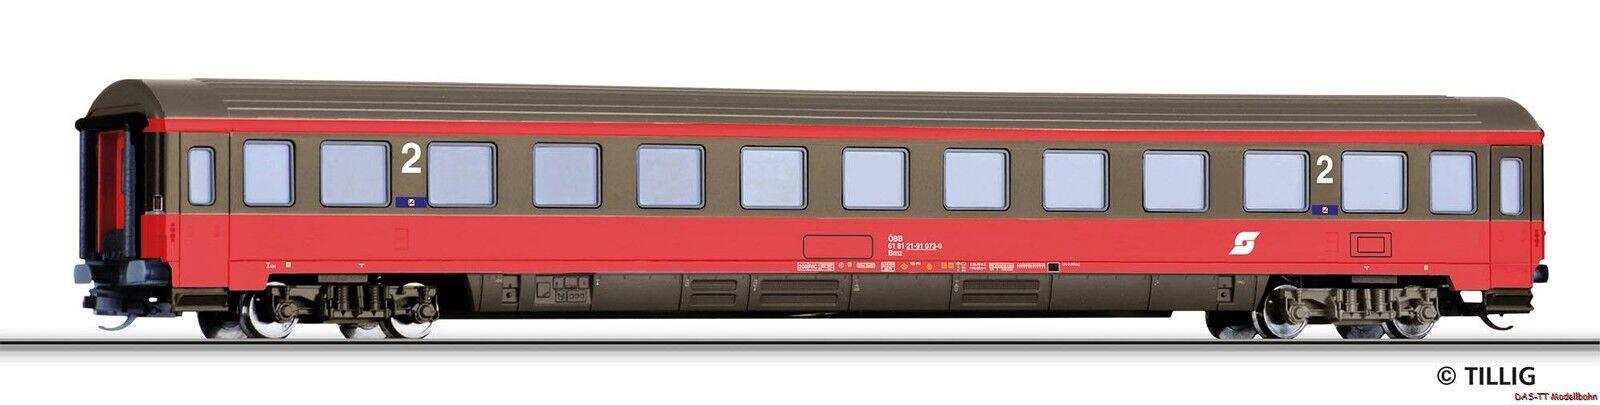 TT viaggiatori 2. KL. BMZ ÖBB Eurofima II ep. V Tillig 16539 NUOVO